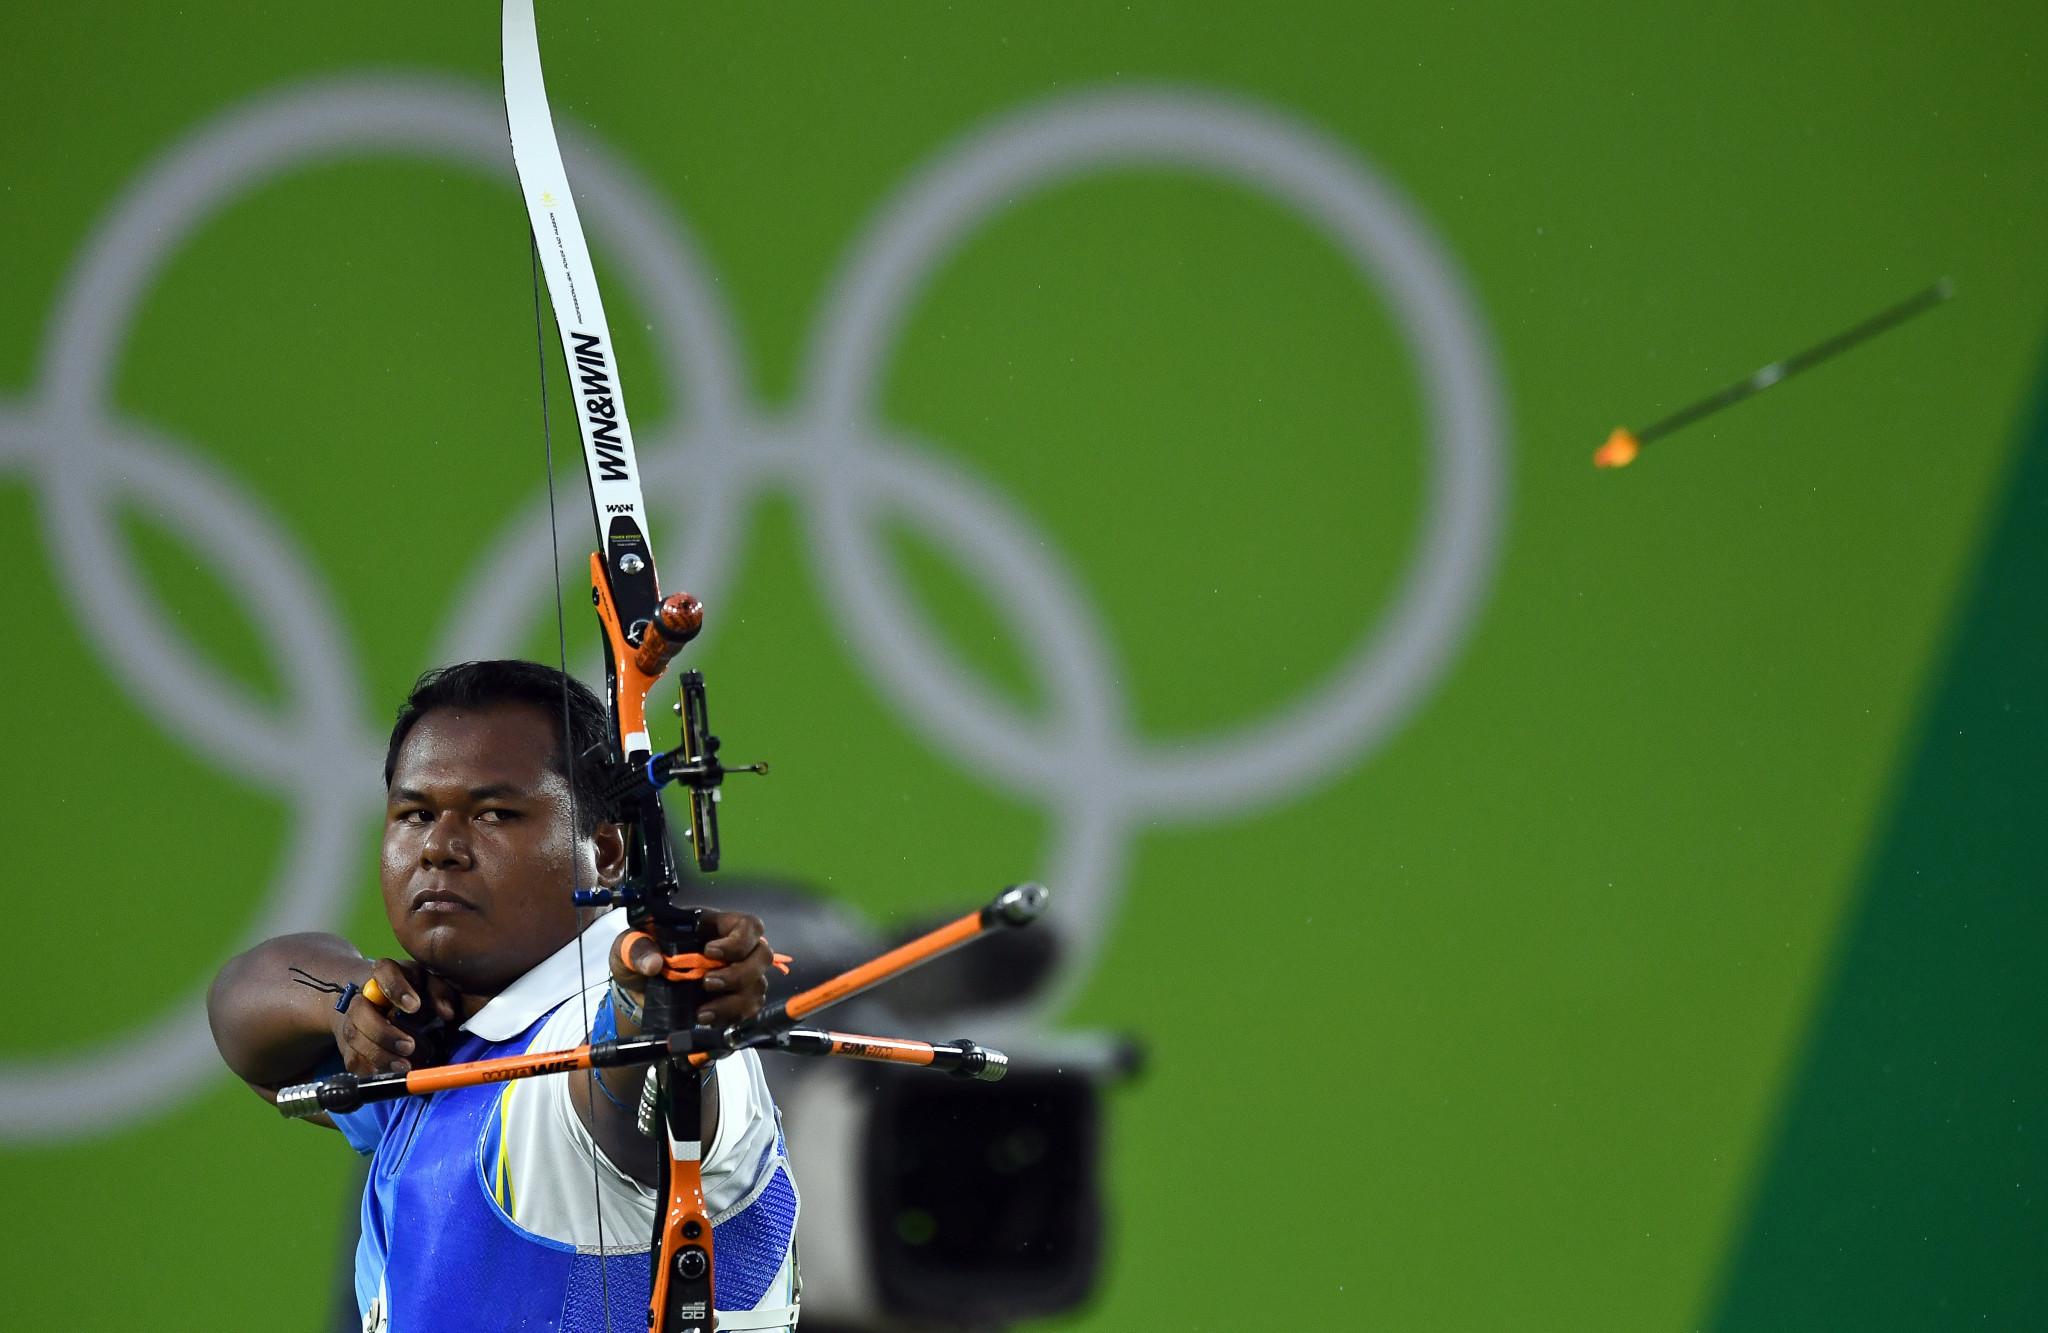 Asian Games archery medallist tragically dies aged just 27